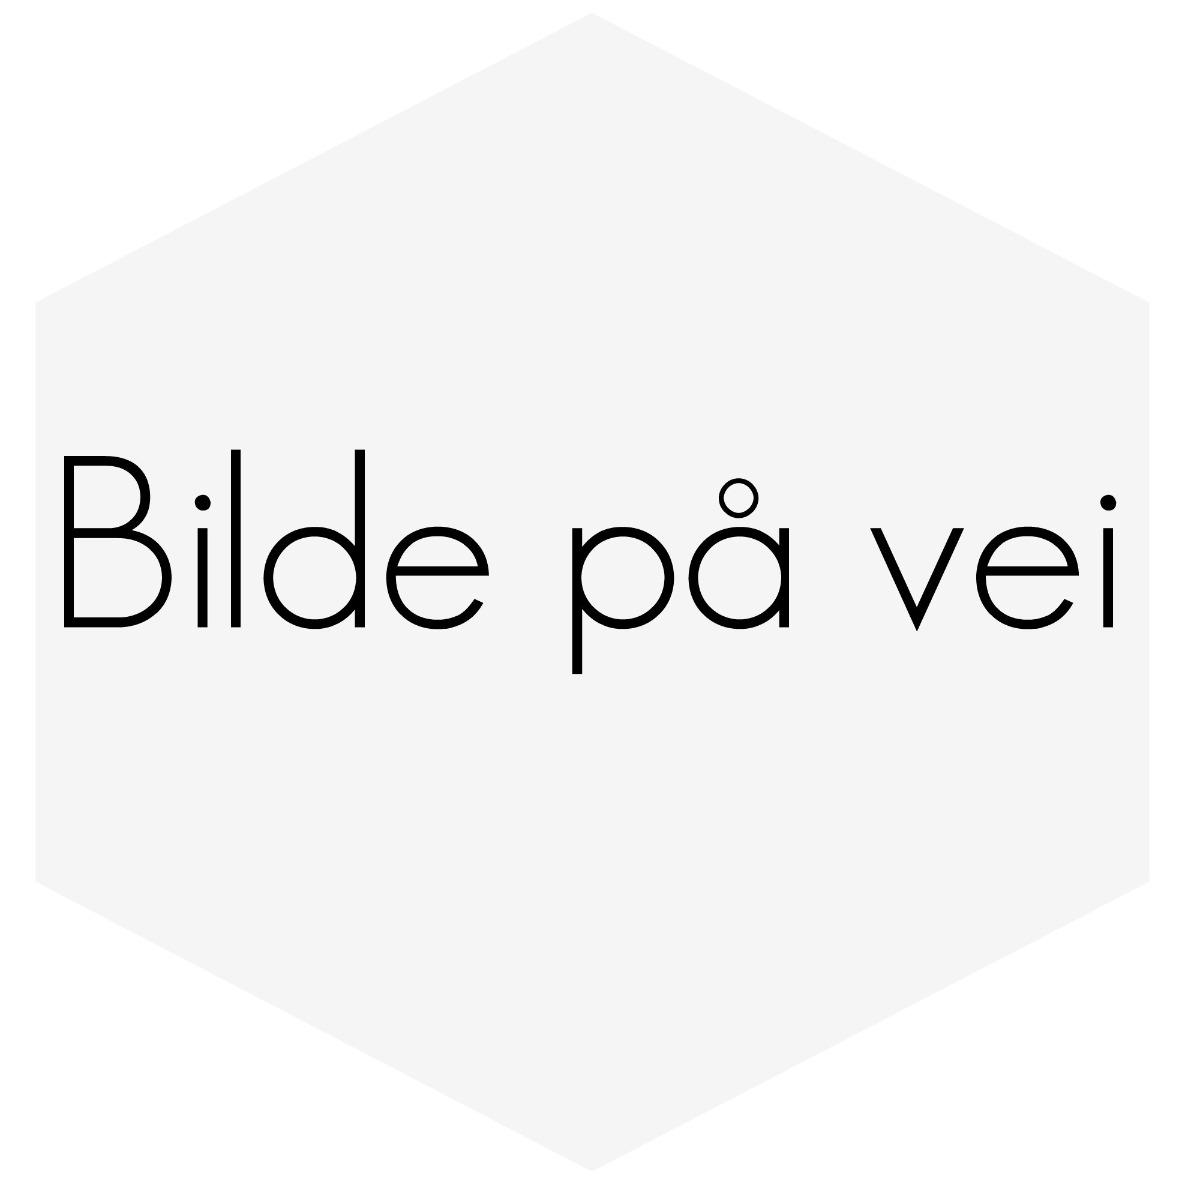 RÅDELAGER VOLVO MANGE TYPER